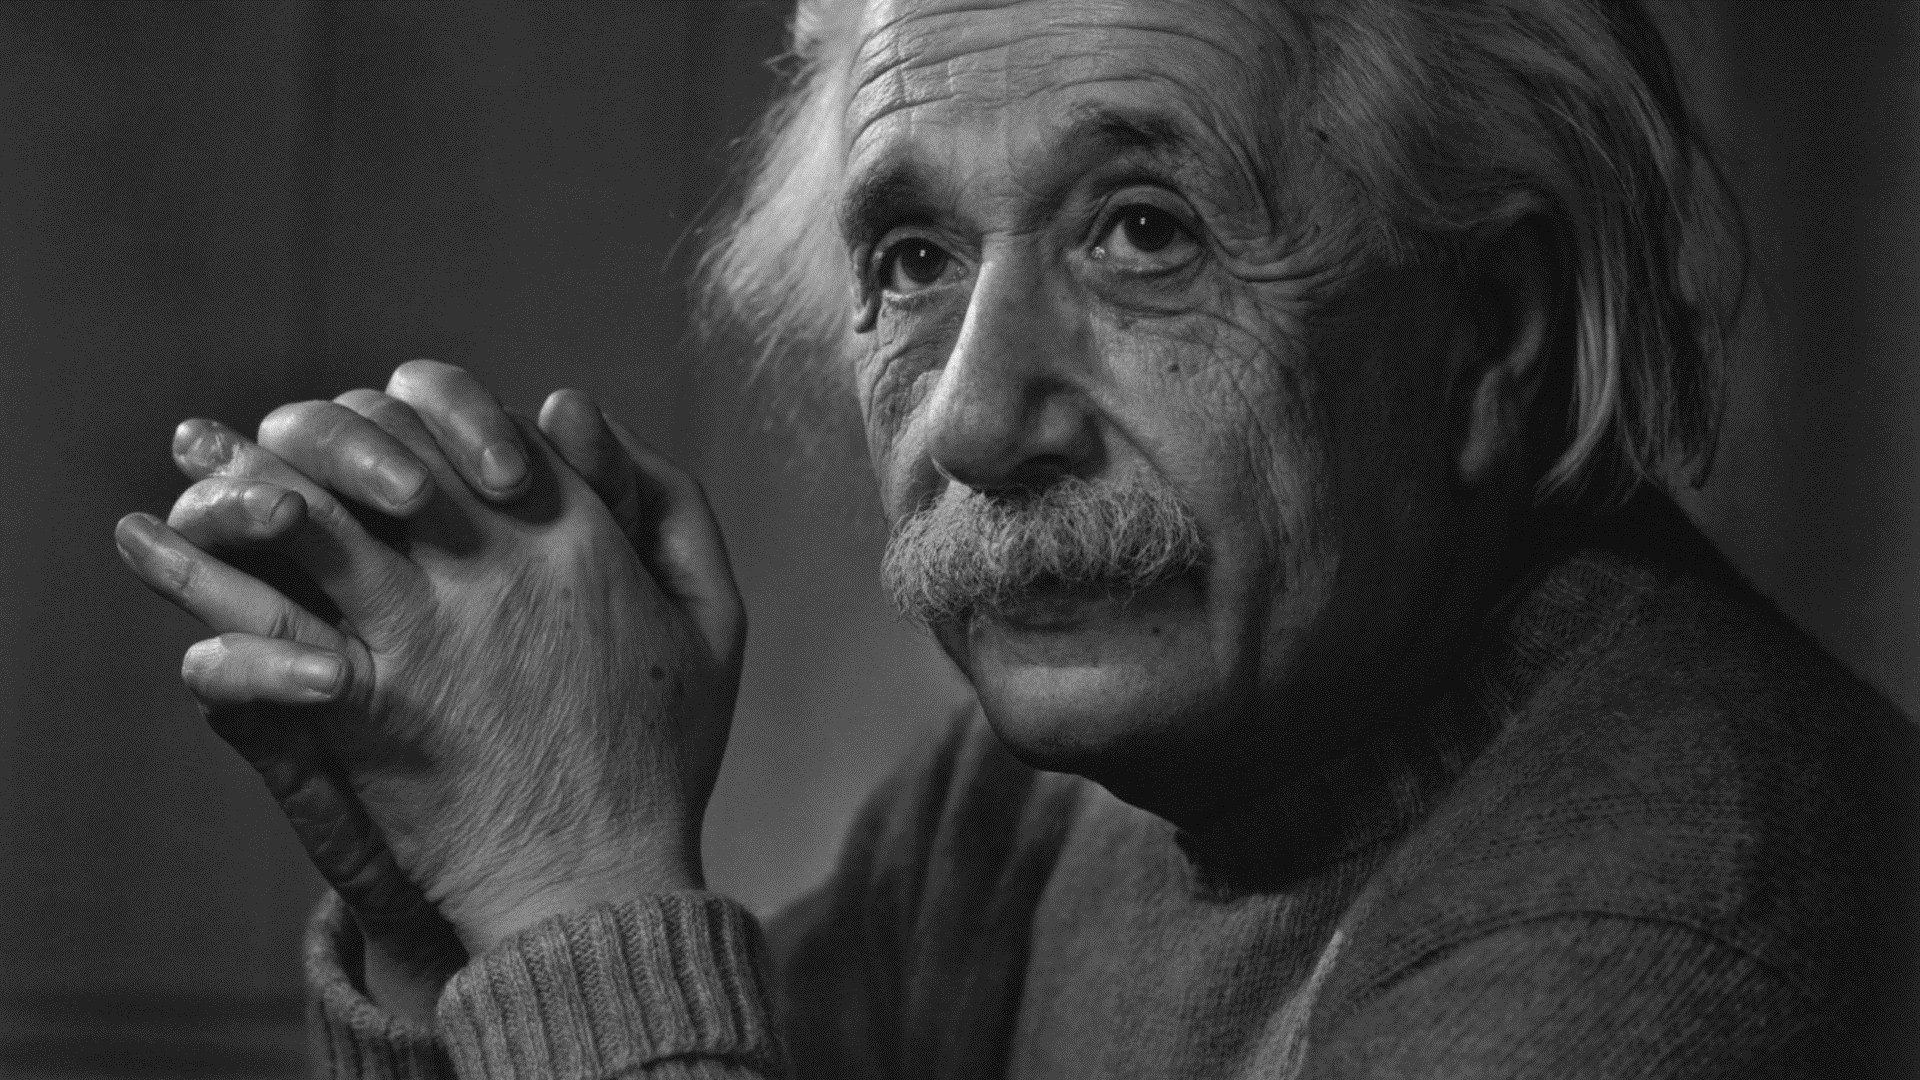 Albert Einstein full hd 1080p wallpaper